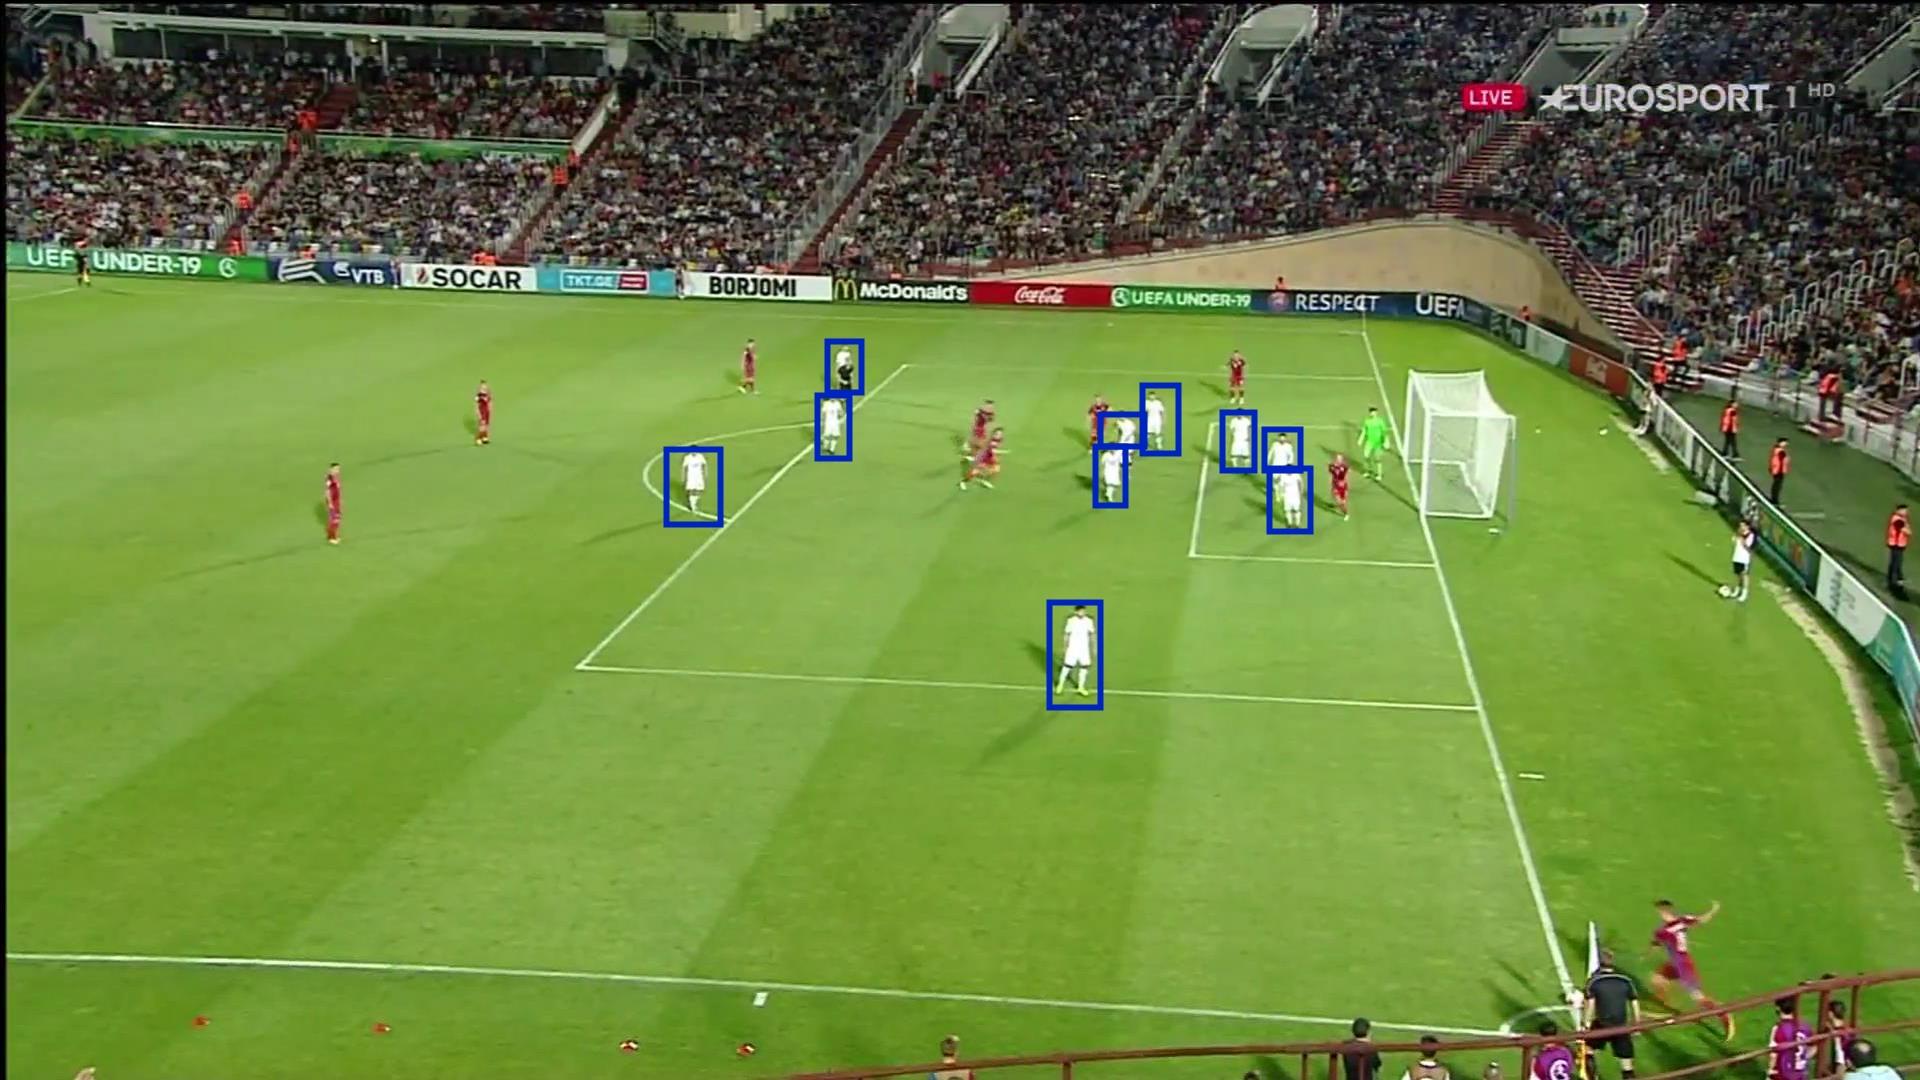 Saque Esquina defendido en Zona. República Checa 2 - Georgia 0. Eurocopa sub19 2017